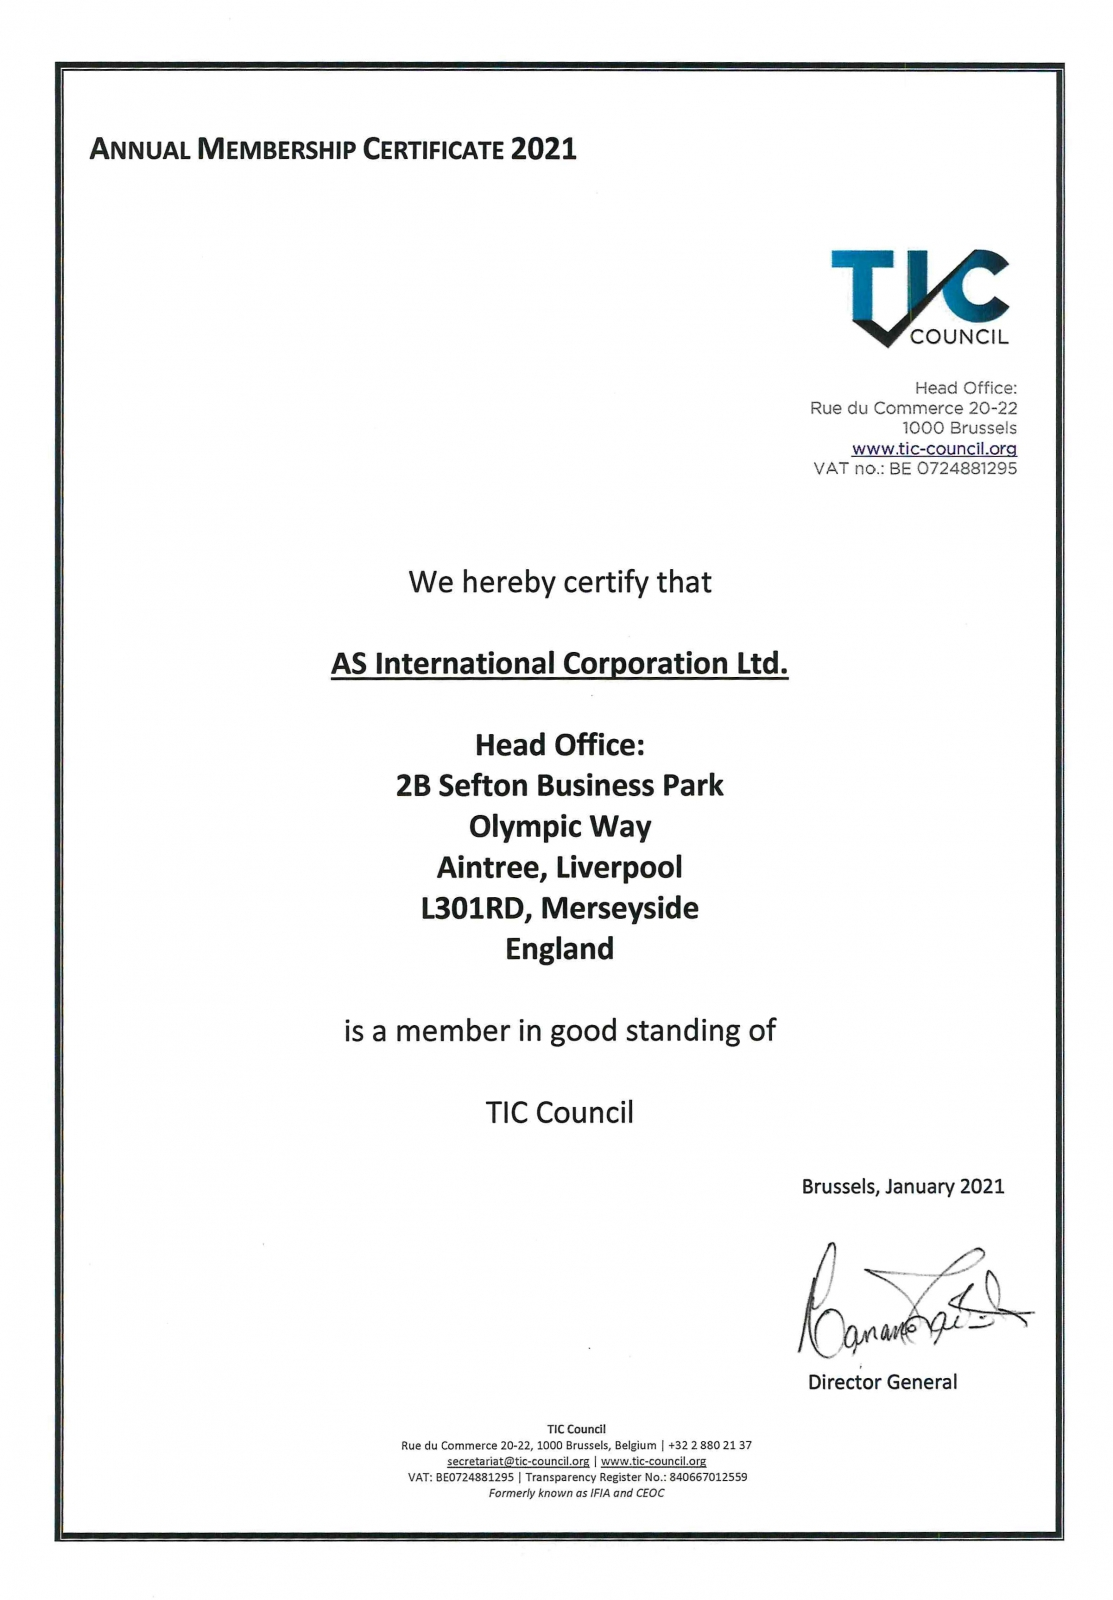 Сертификат членства TIC Council